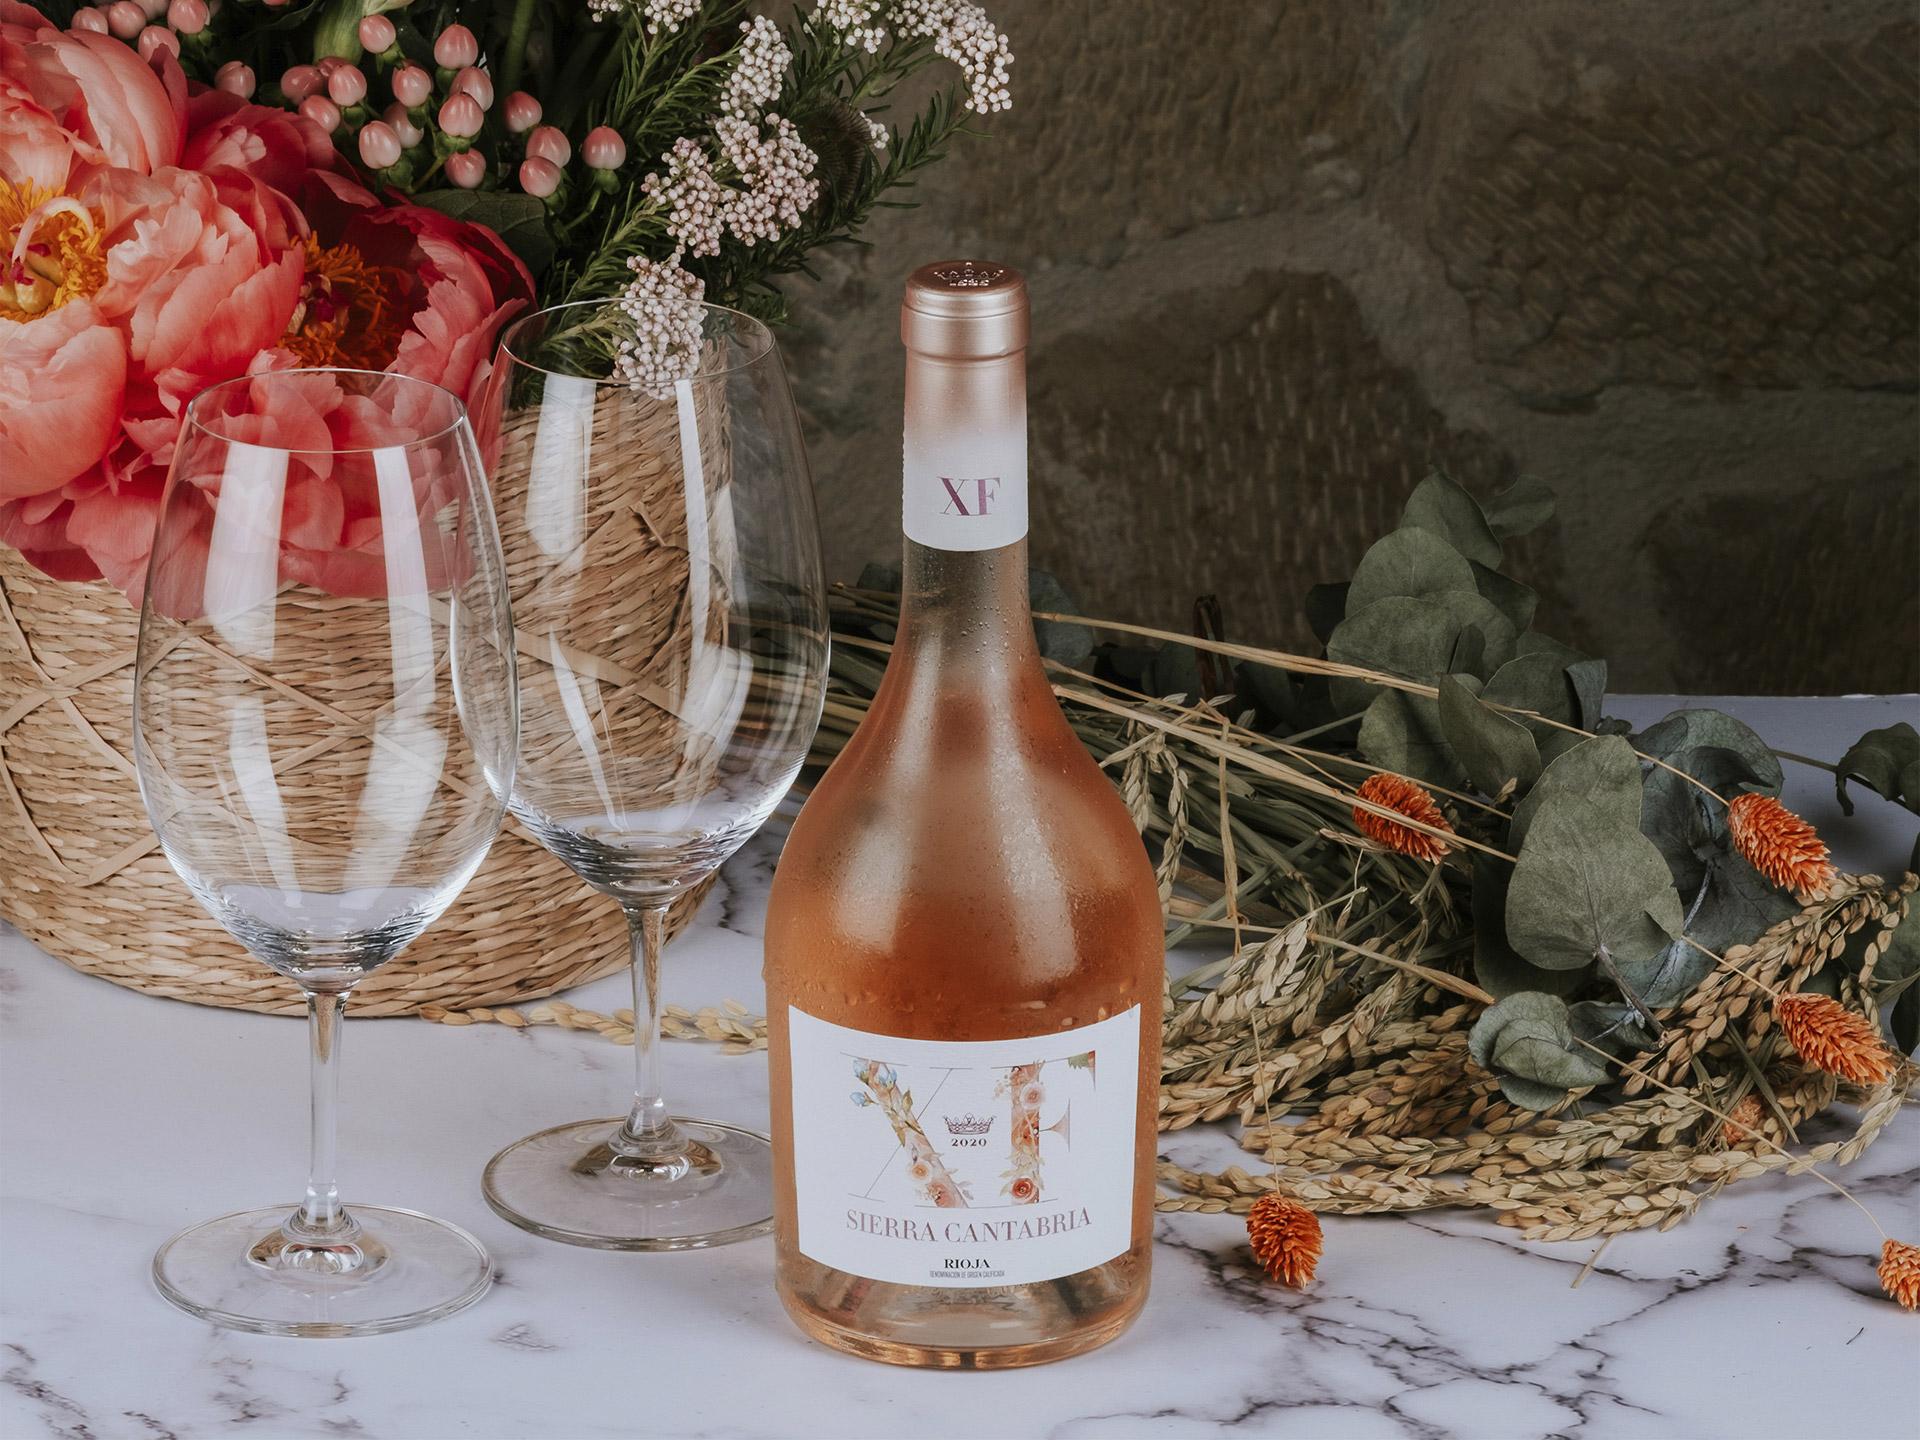 Diseño packaging vino rosado XF Sierra Cantabria